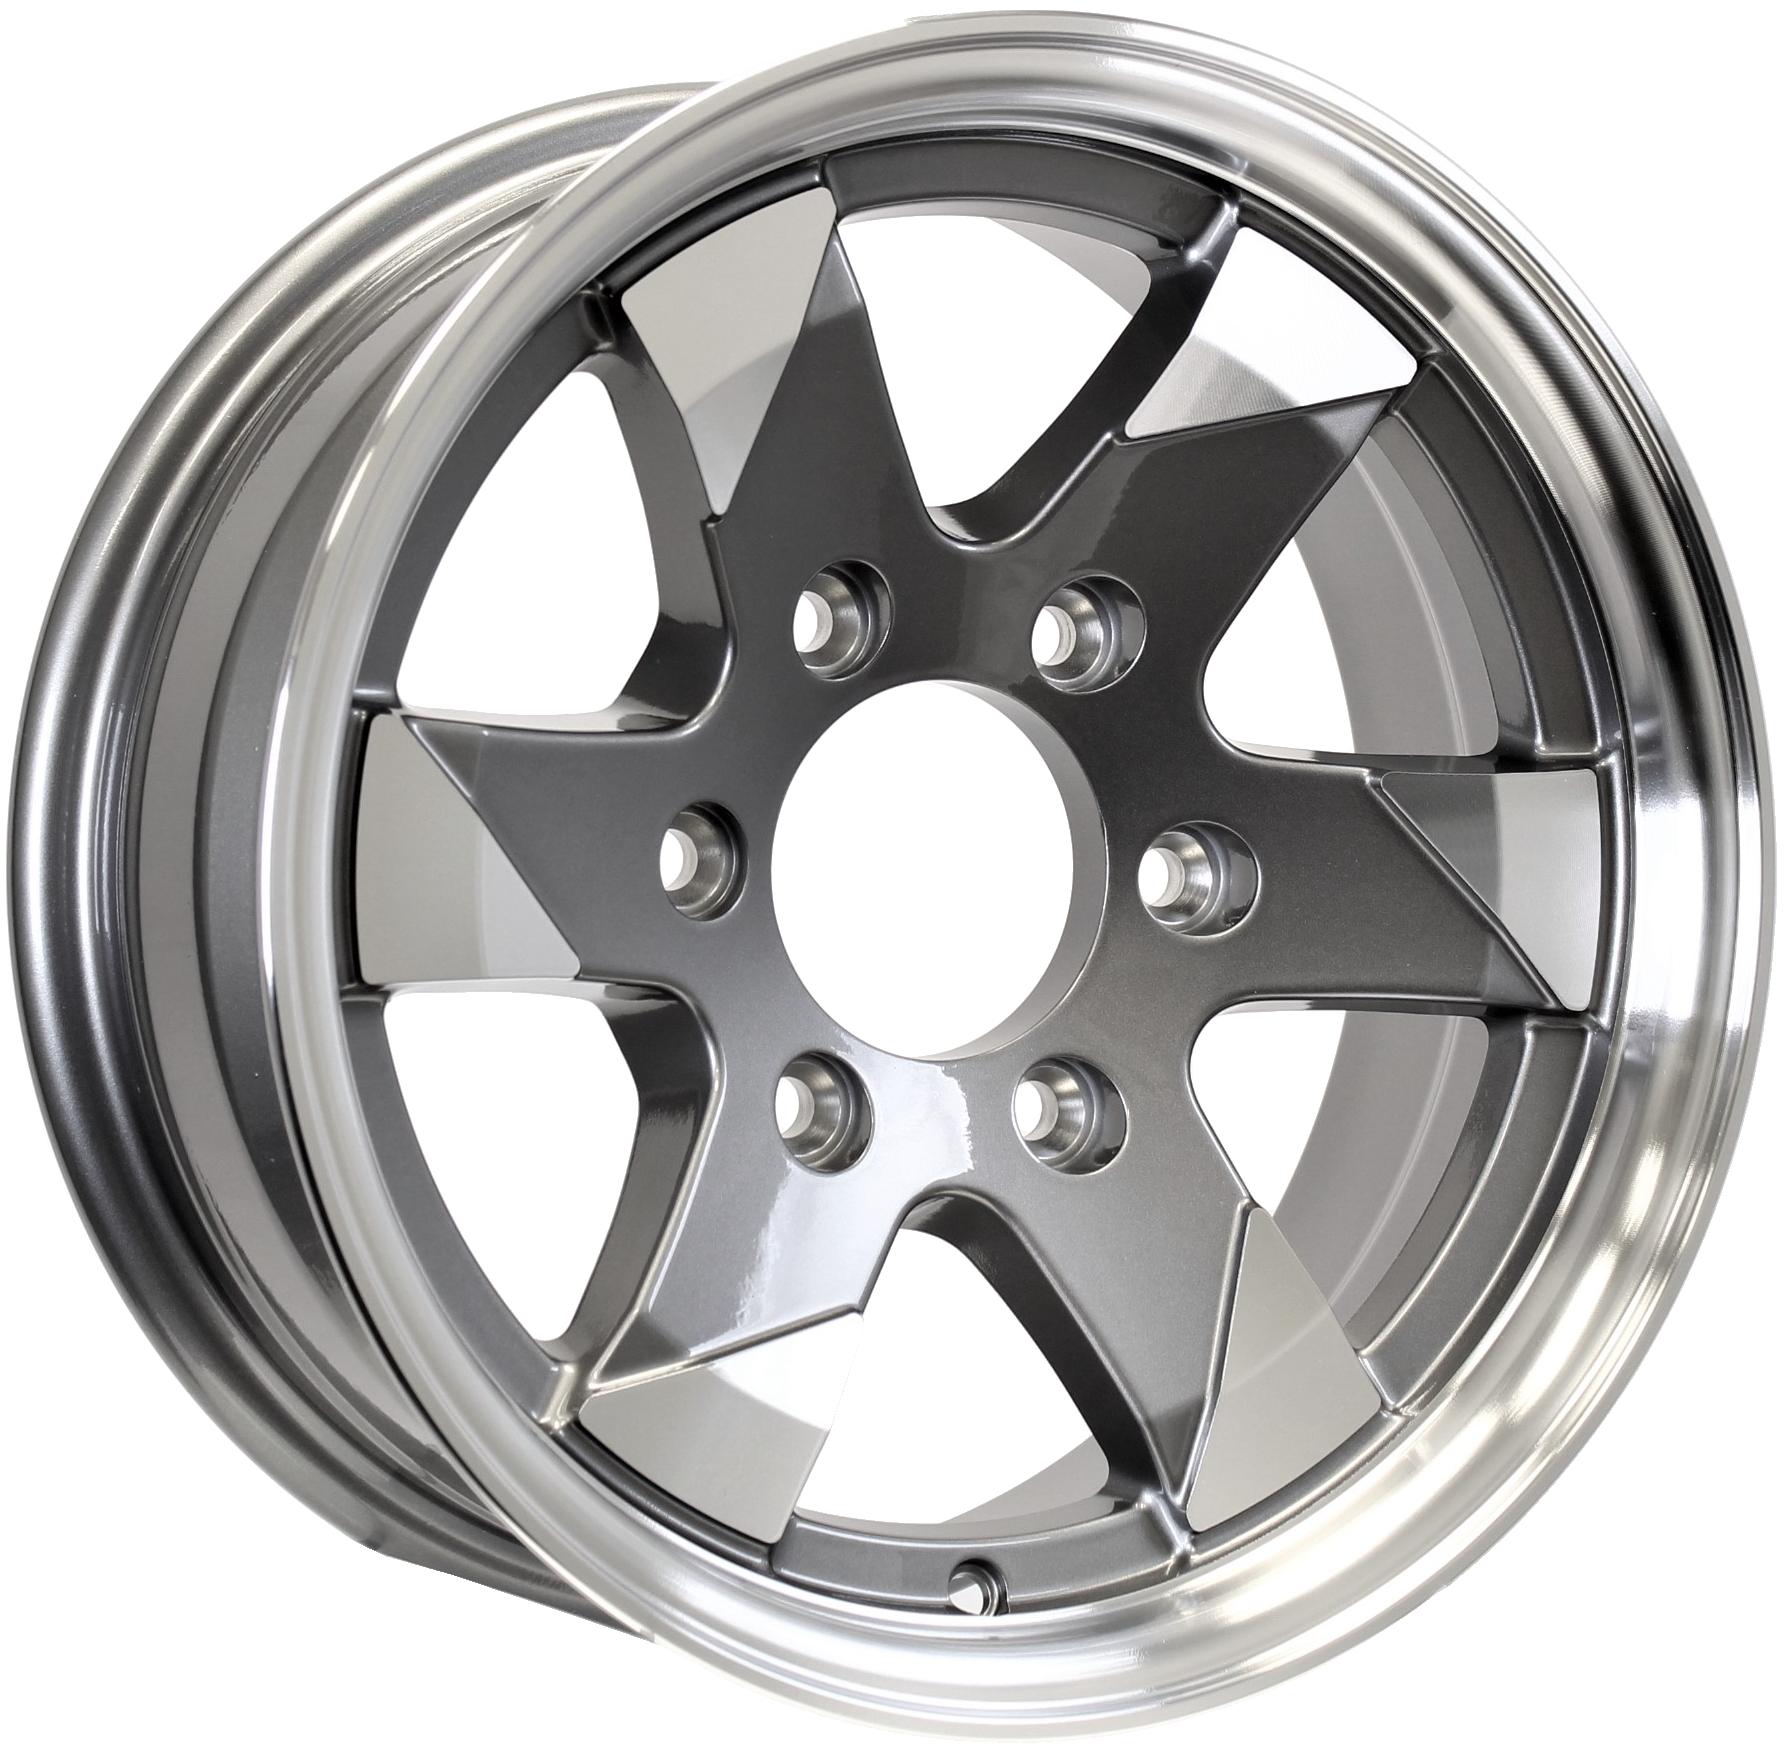 Ascent- 15x6 6-5.5 Gun Metal Aluminum Trailer Wheel Image